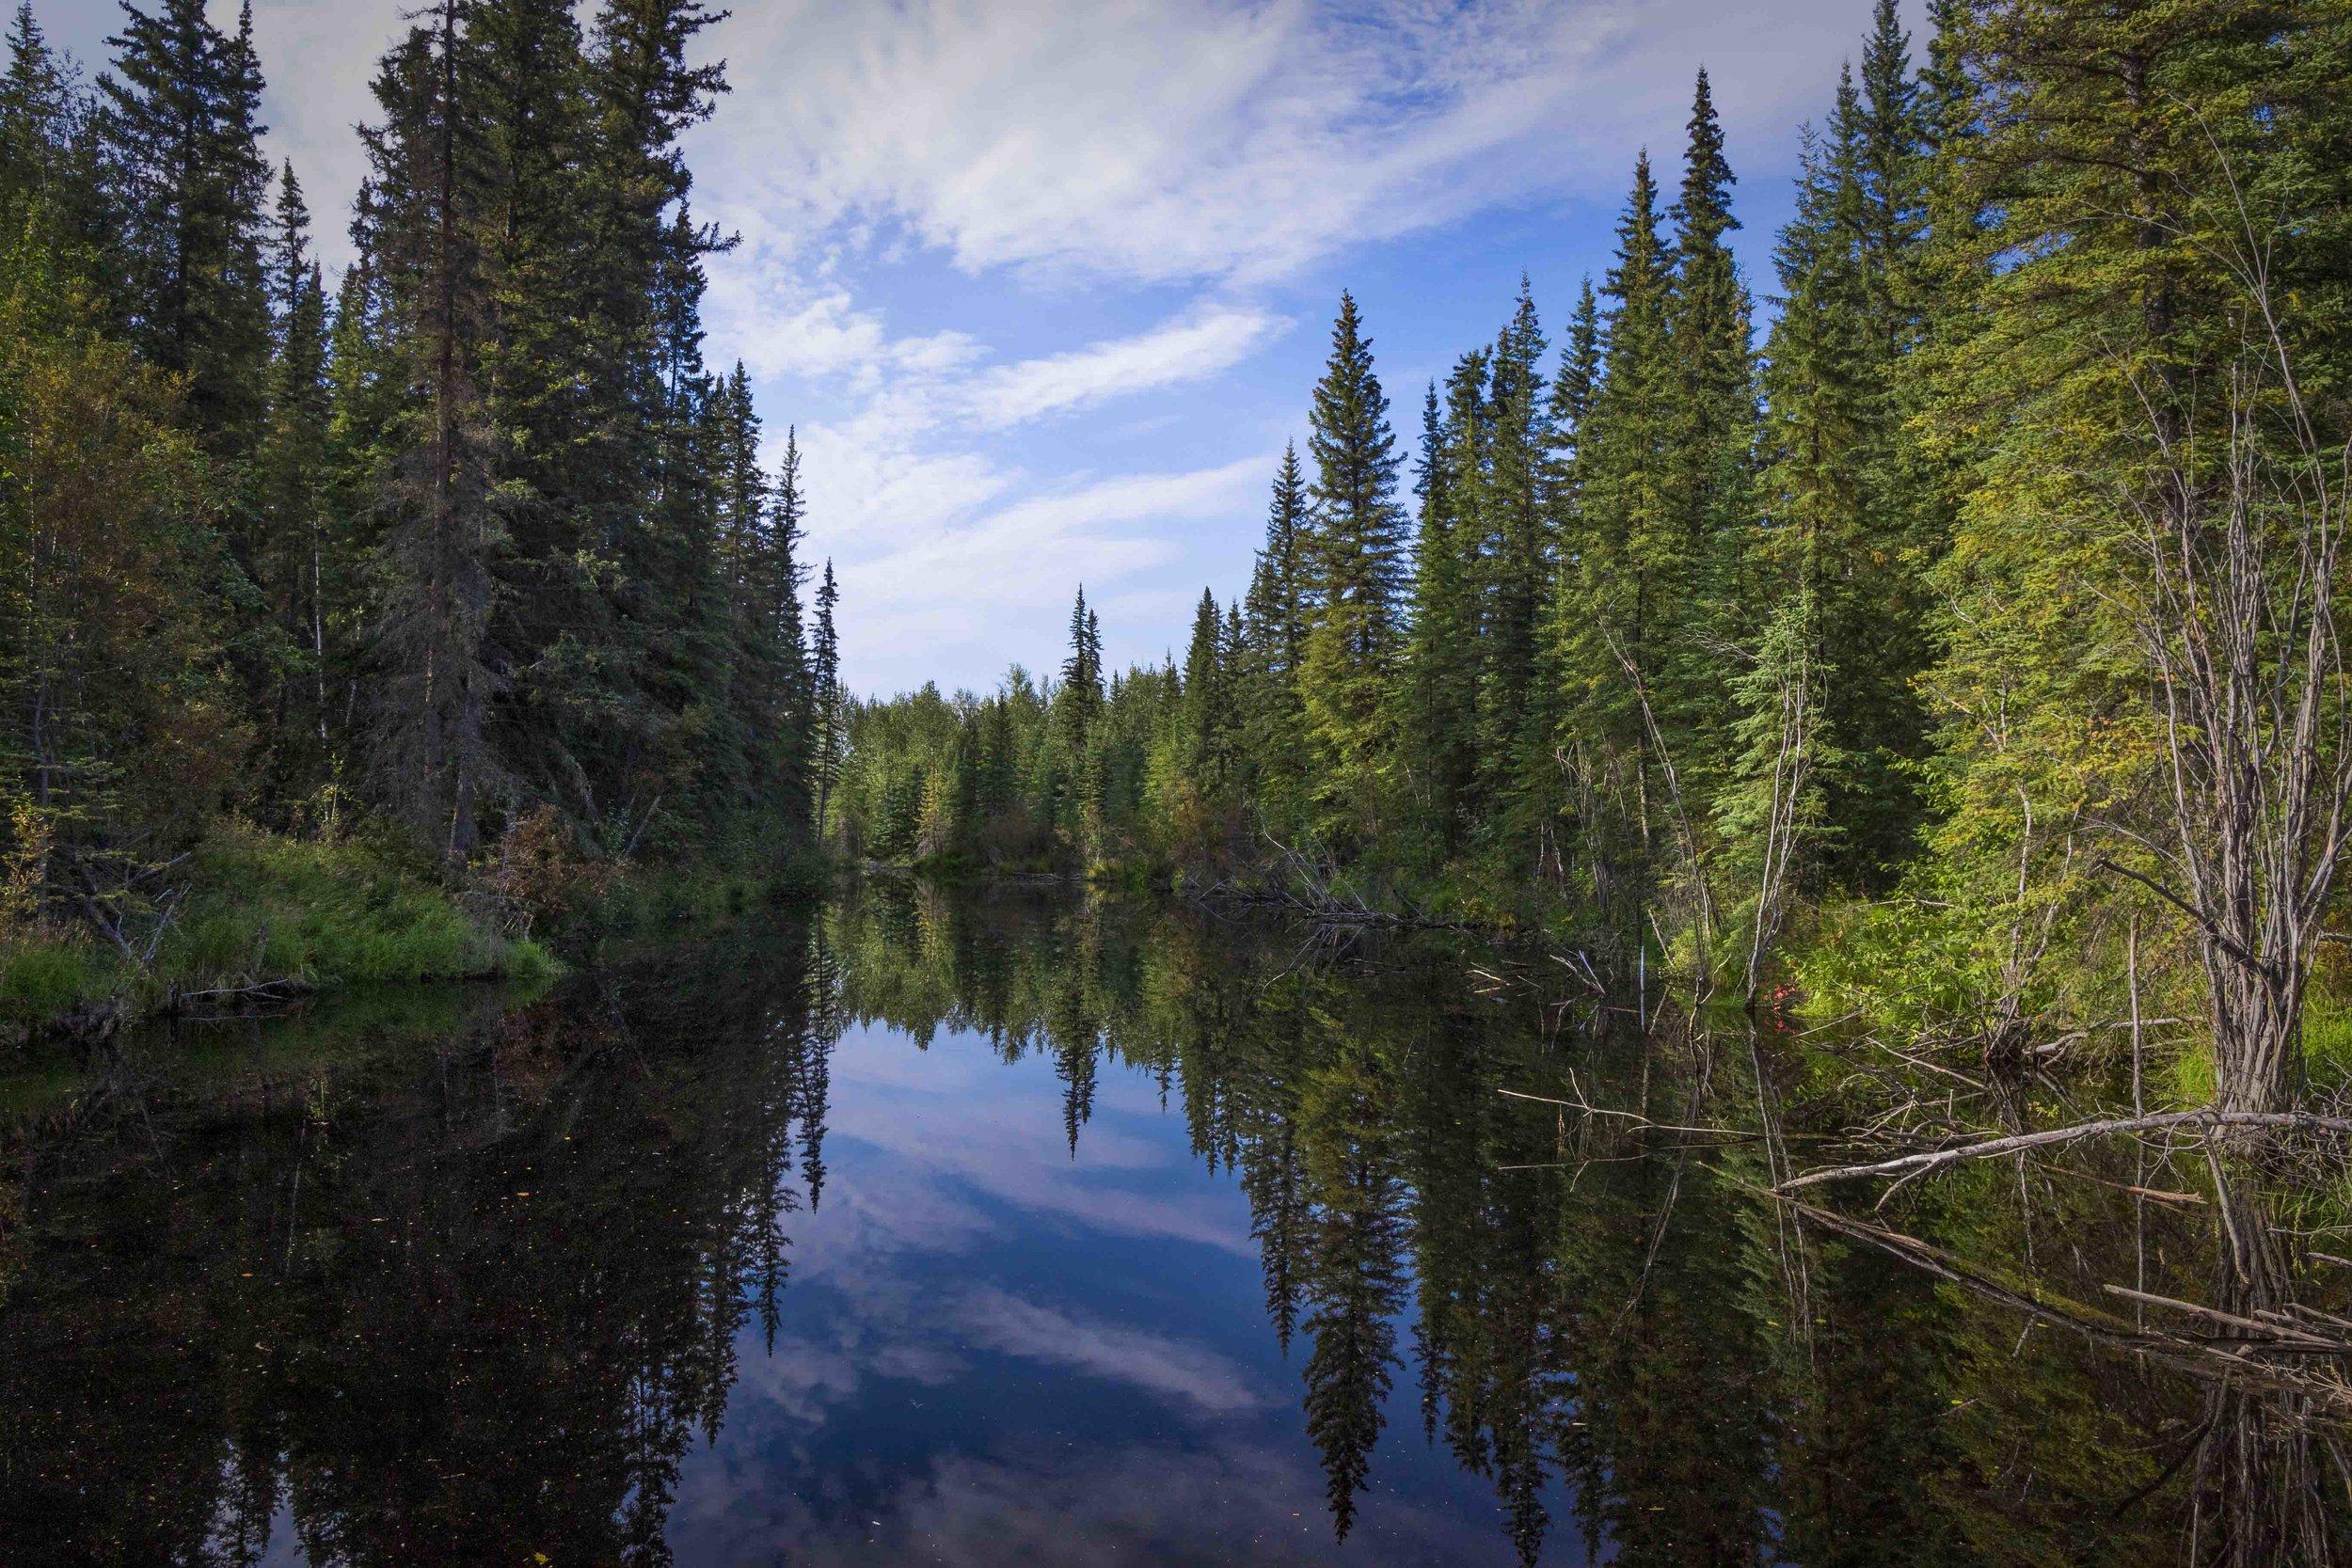 Dempster Highway, Roadtrip, Landscape, Arctic, rob gubiani, Tundra, Tombstone, Tuktoyuktuk, Inuvik, Dempster, Yukon, travel, wanderlust, boreal, forest, boreal forest, mirror,